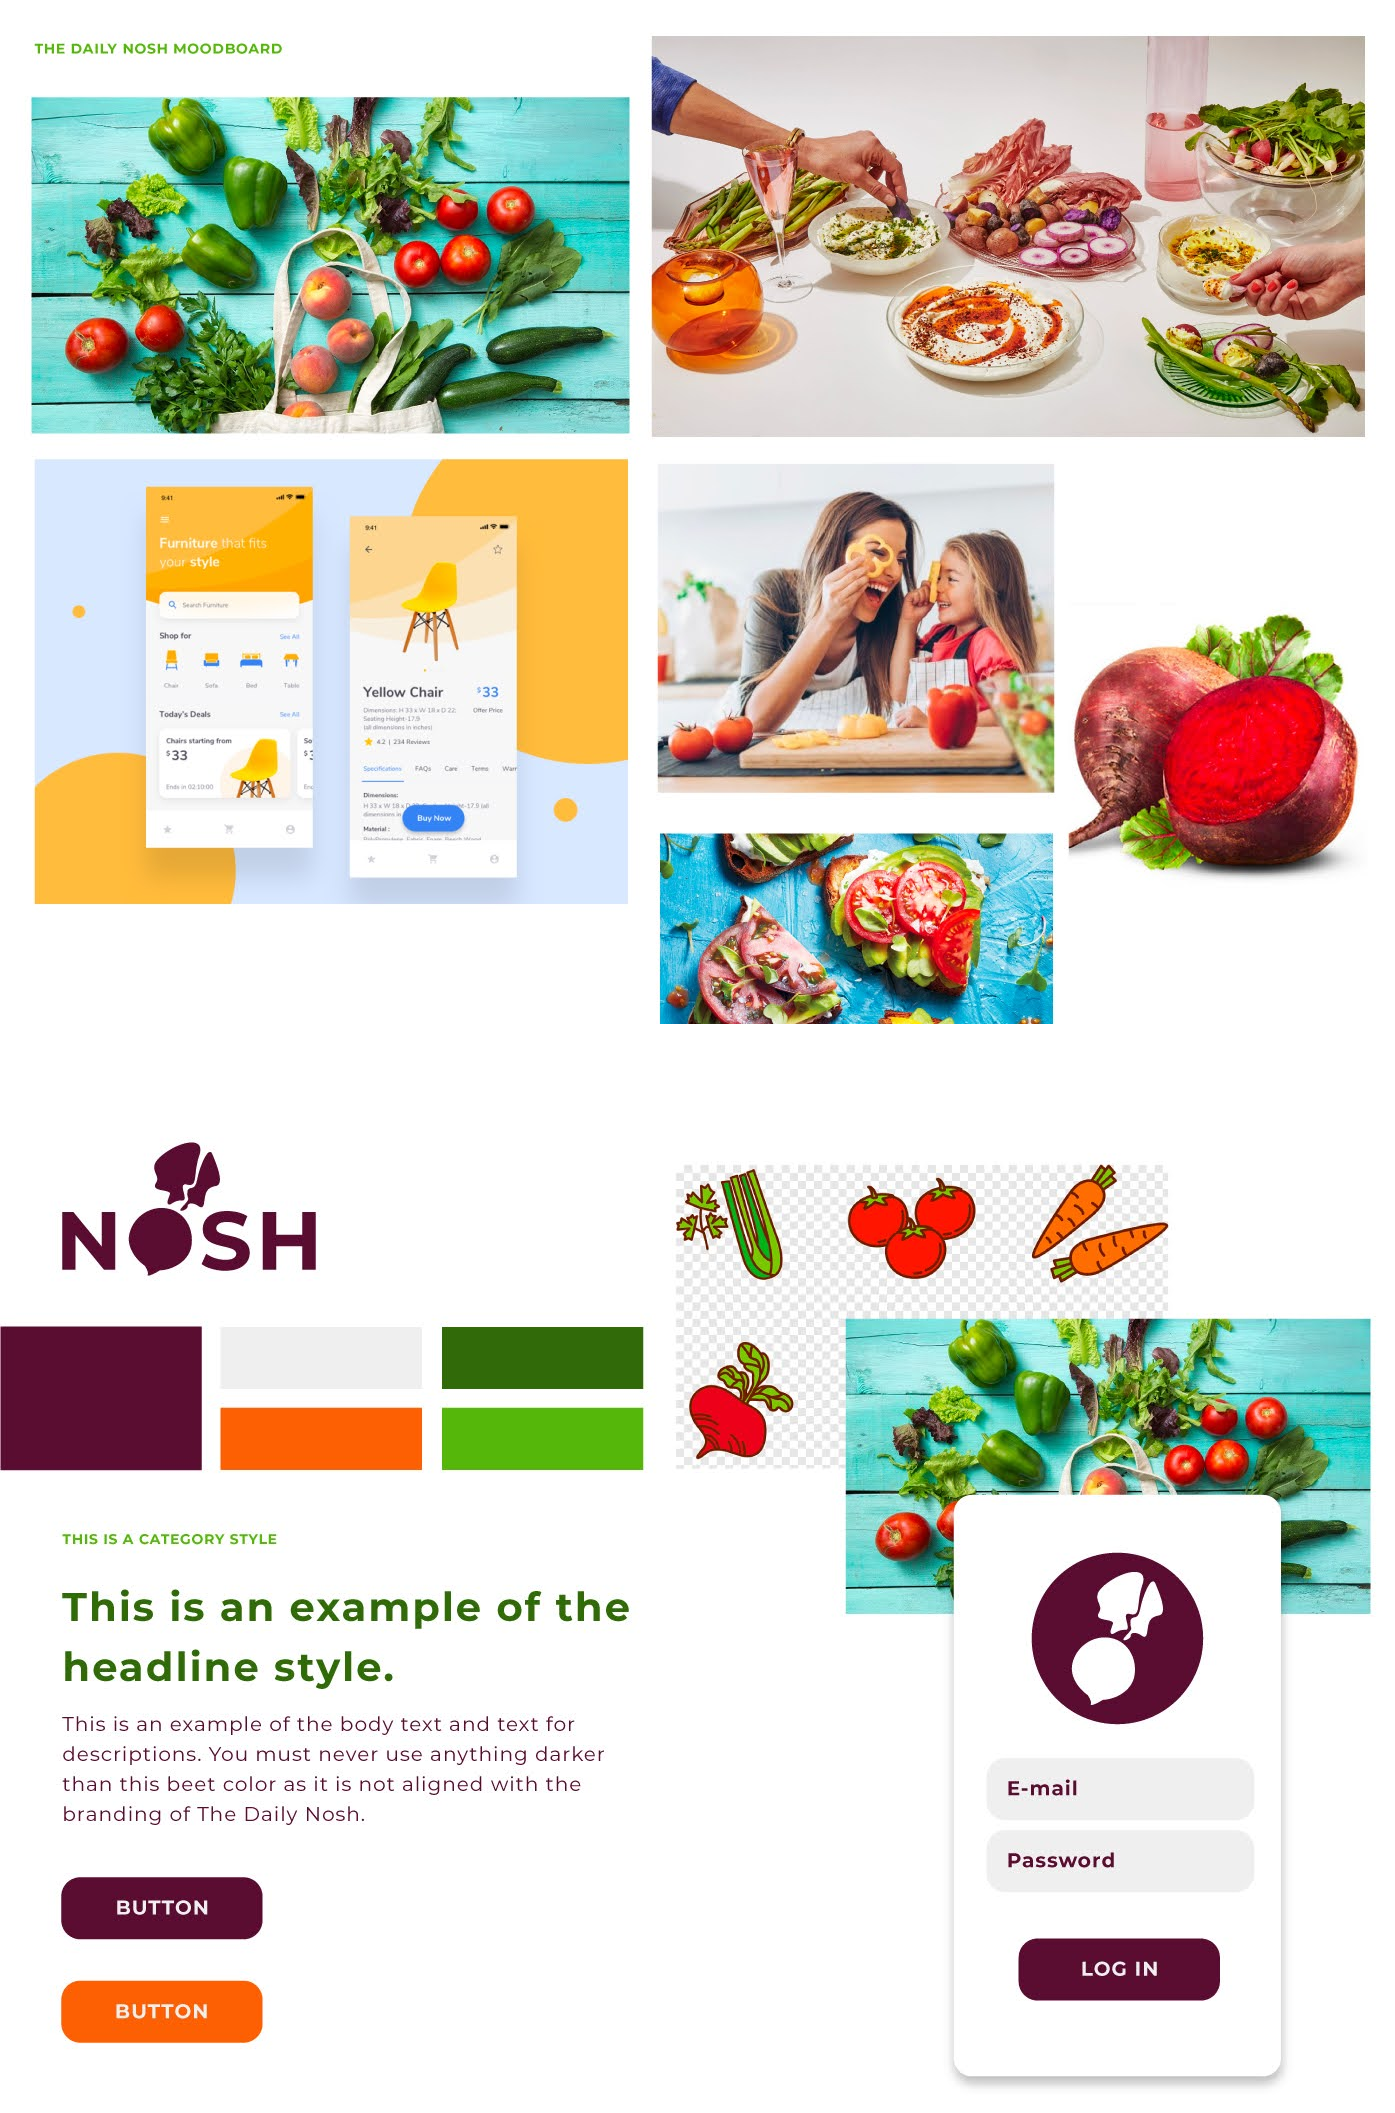 Daily Nosh mood board